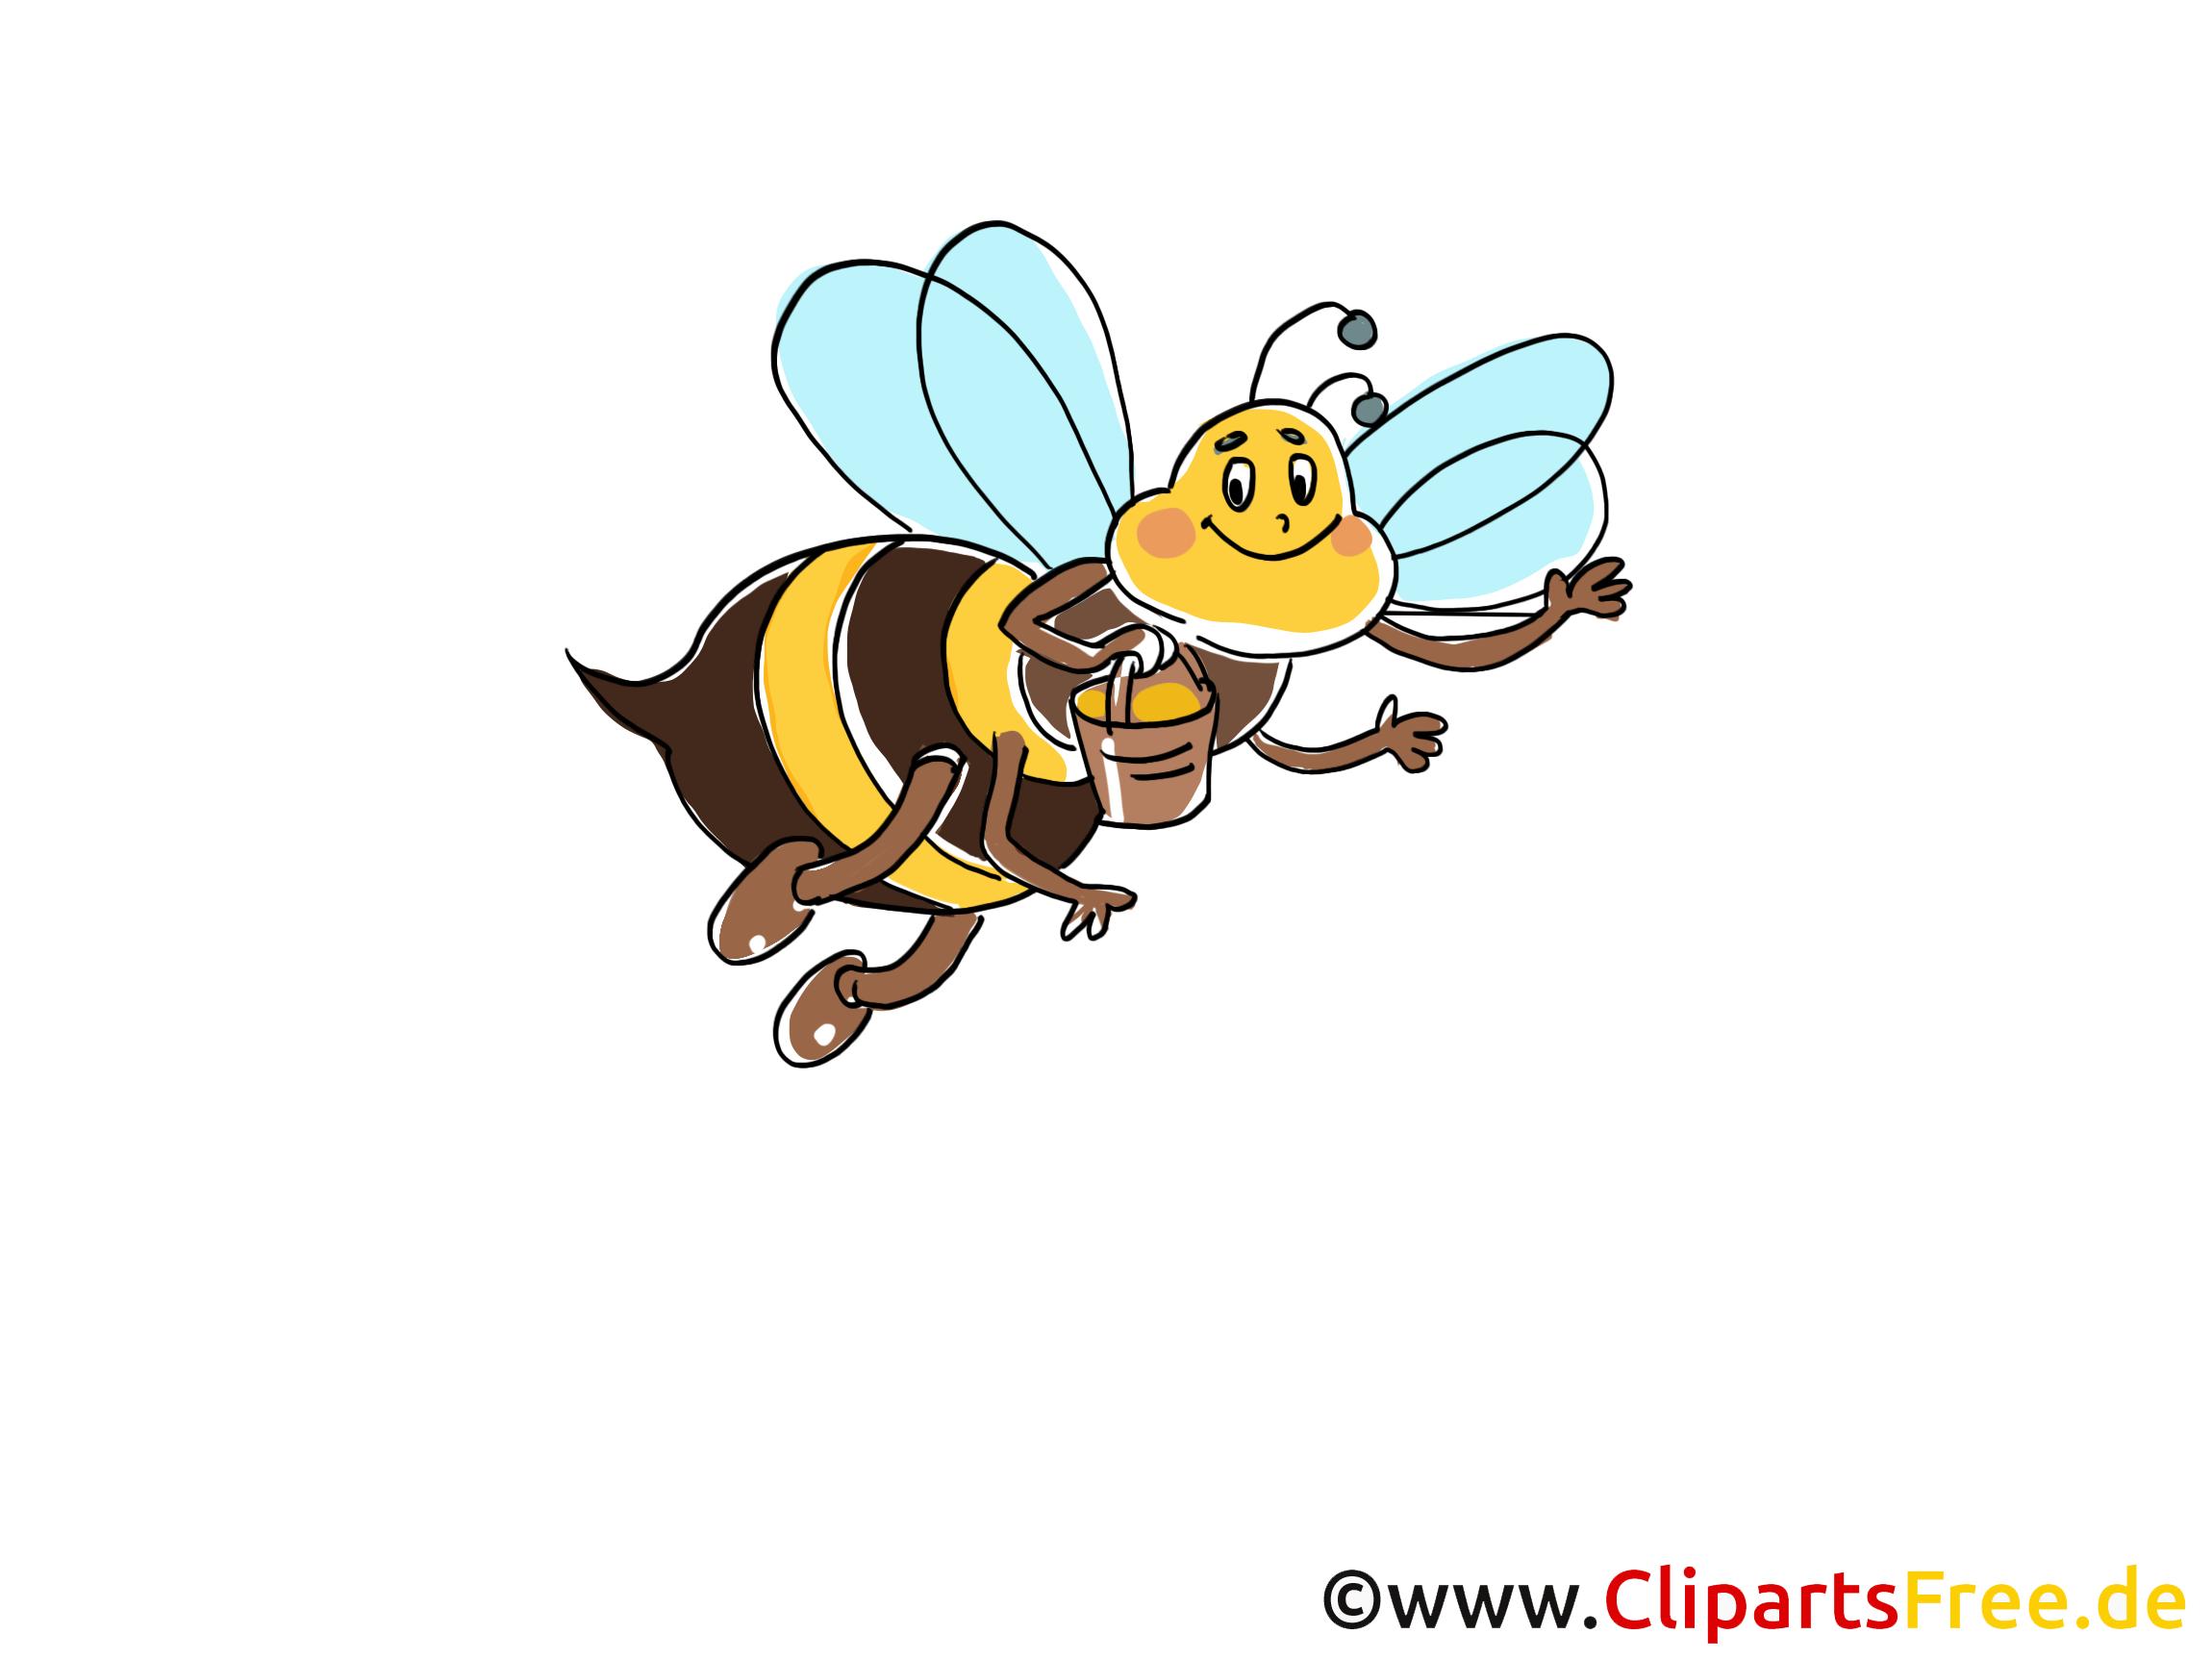 Biene sammelt Honig Bild, Comic, Cartoon, Clipart gratis